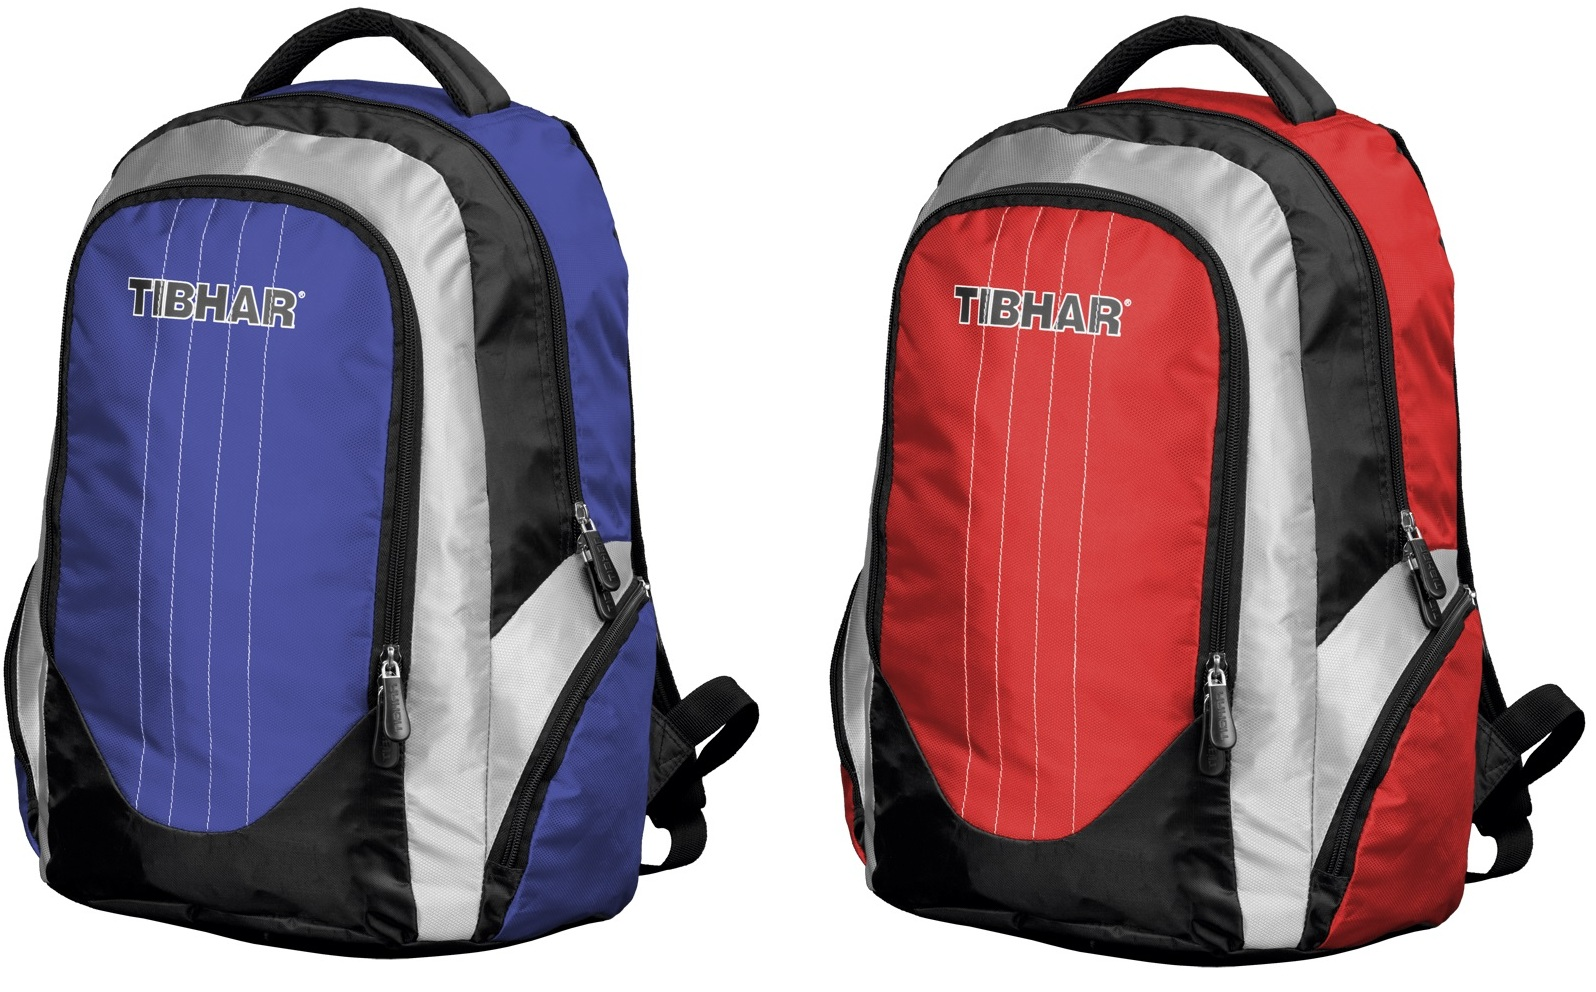 Tibhar Spy Table Tennis Backpack